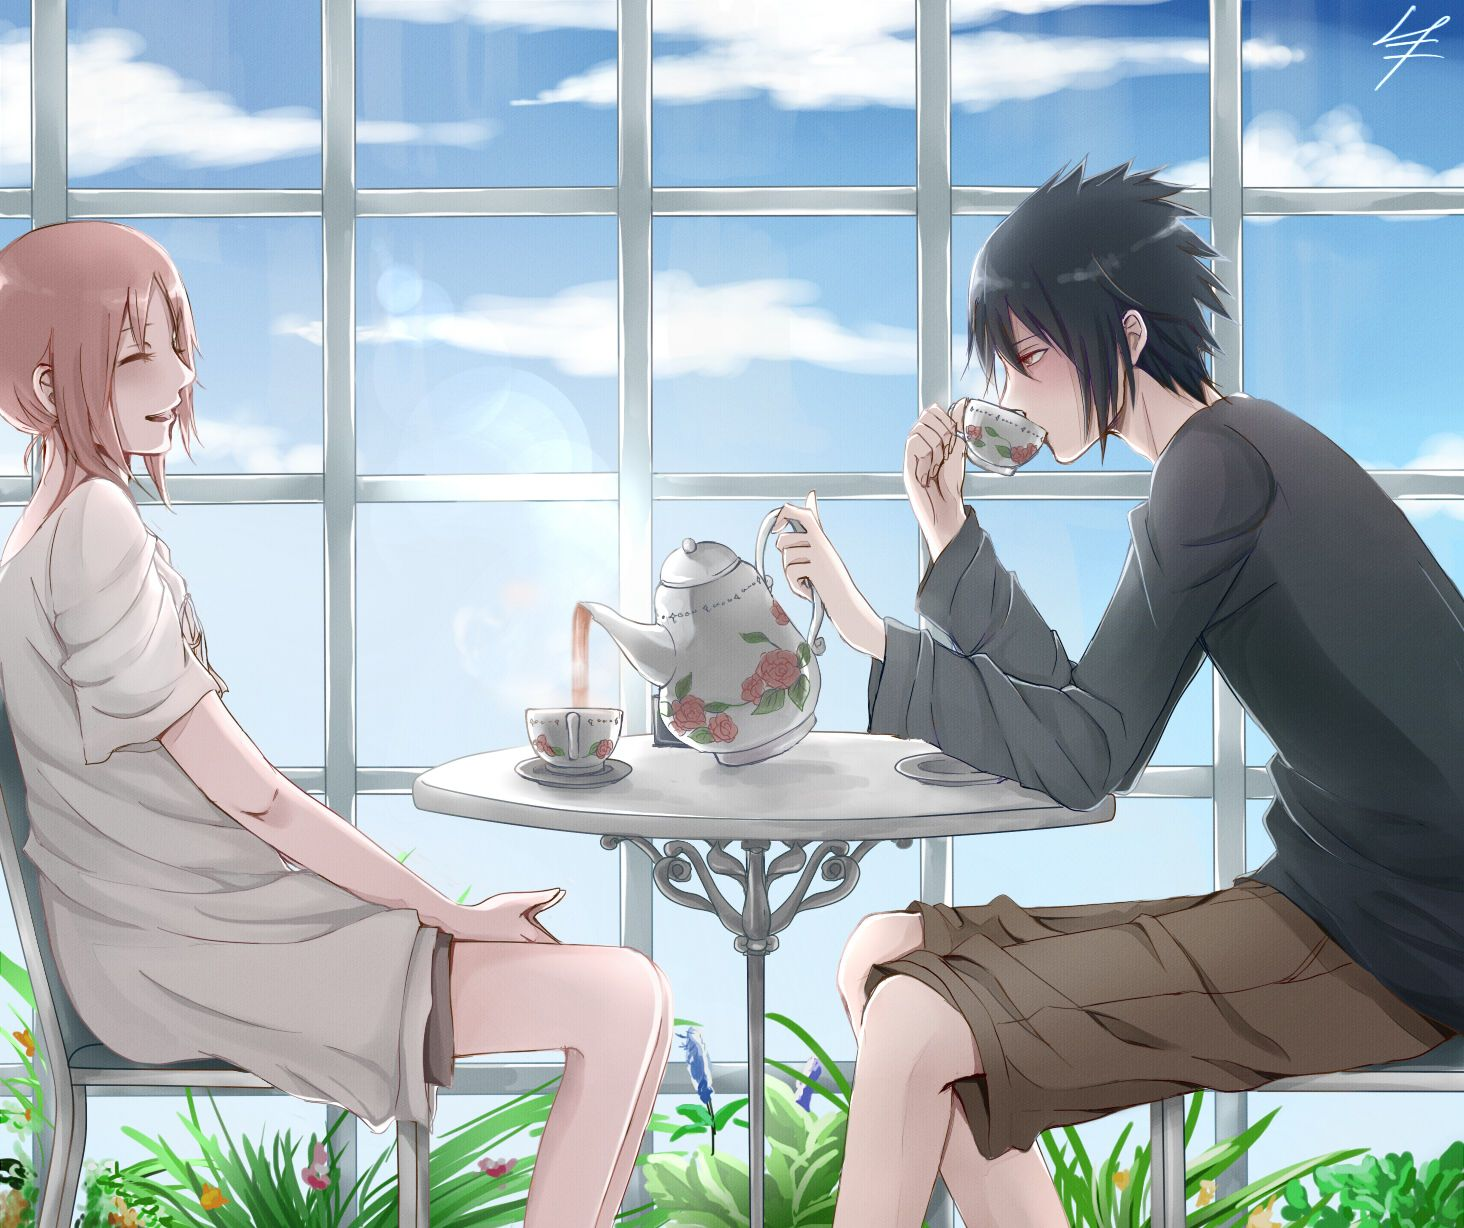 sweet couple sasuke uchiha - photo #48